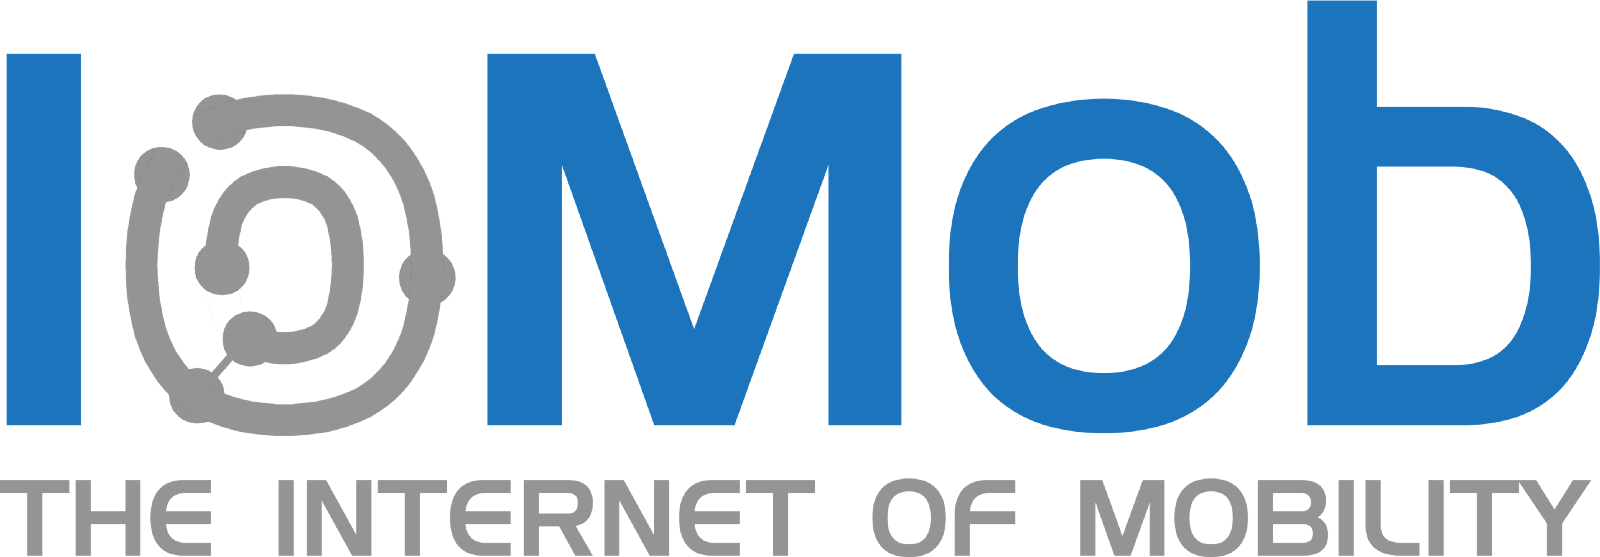 iomon-logo.png